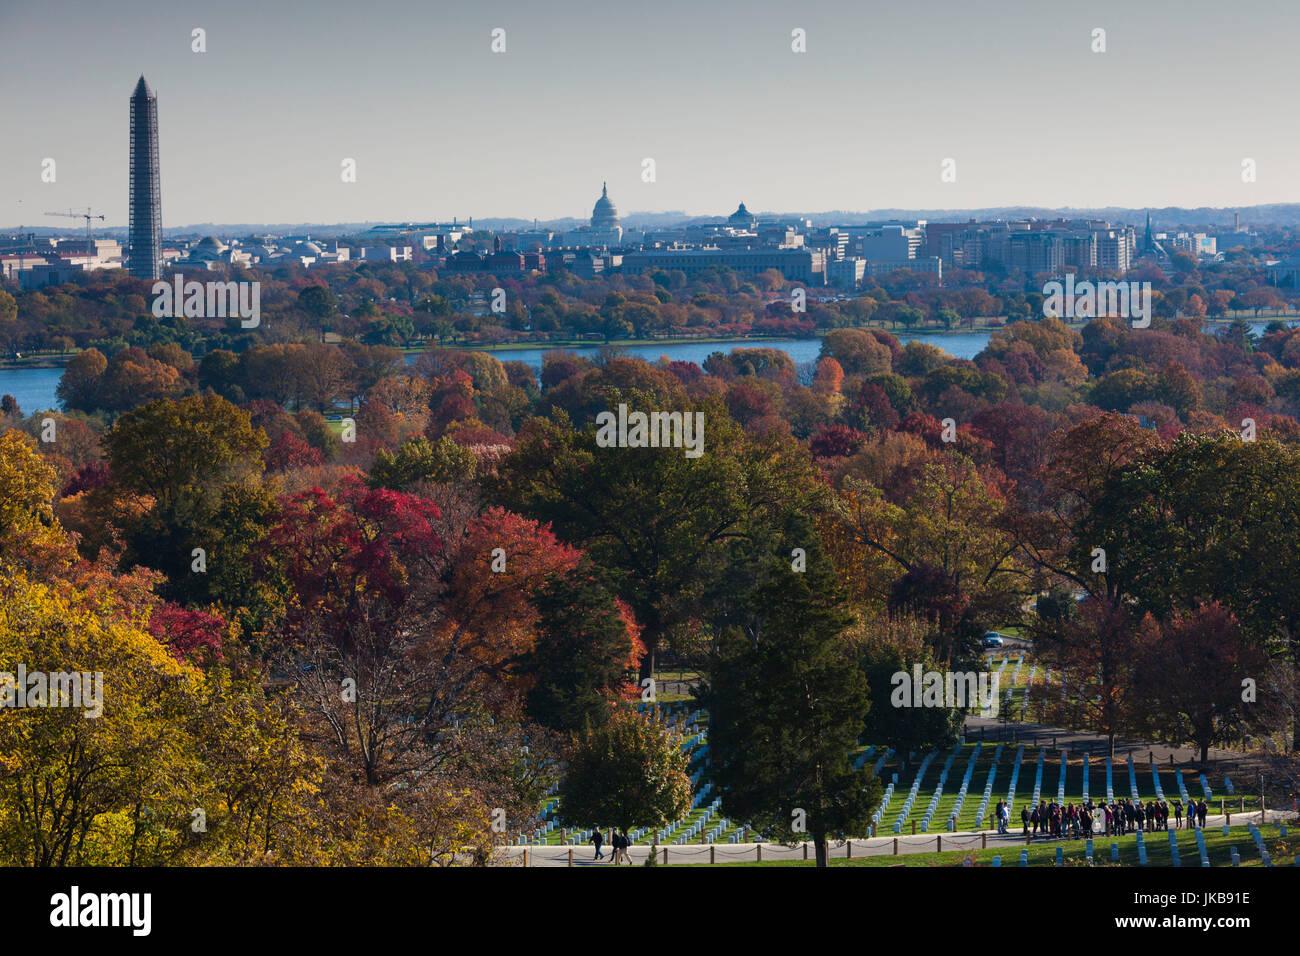 USA, Virginia, Arlington, Arlington National Cemetery, elevated view towards Washington Monument, US Capitol and - Stock Image